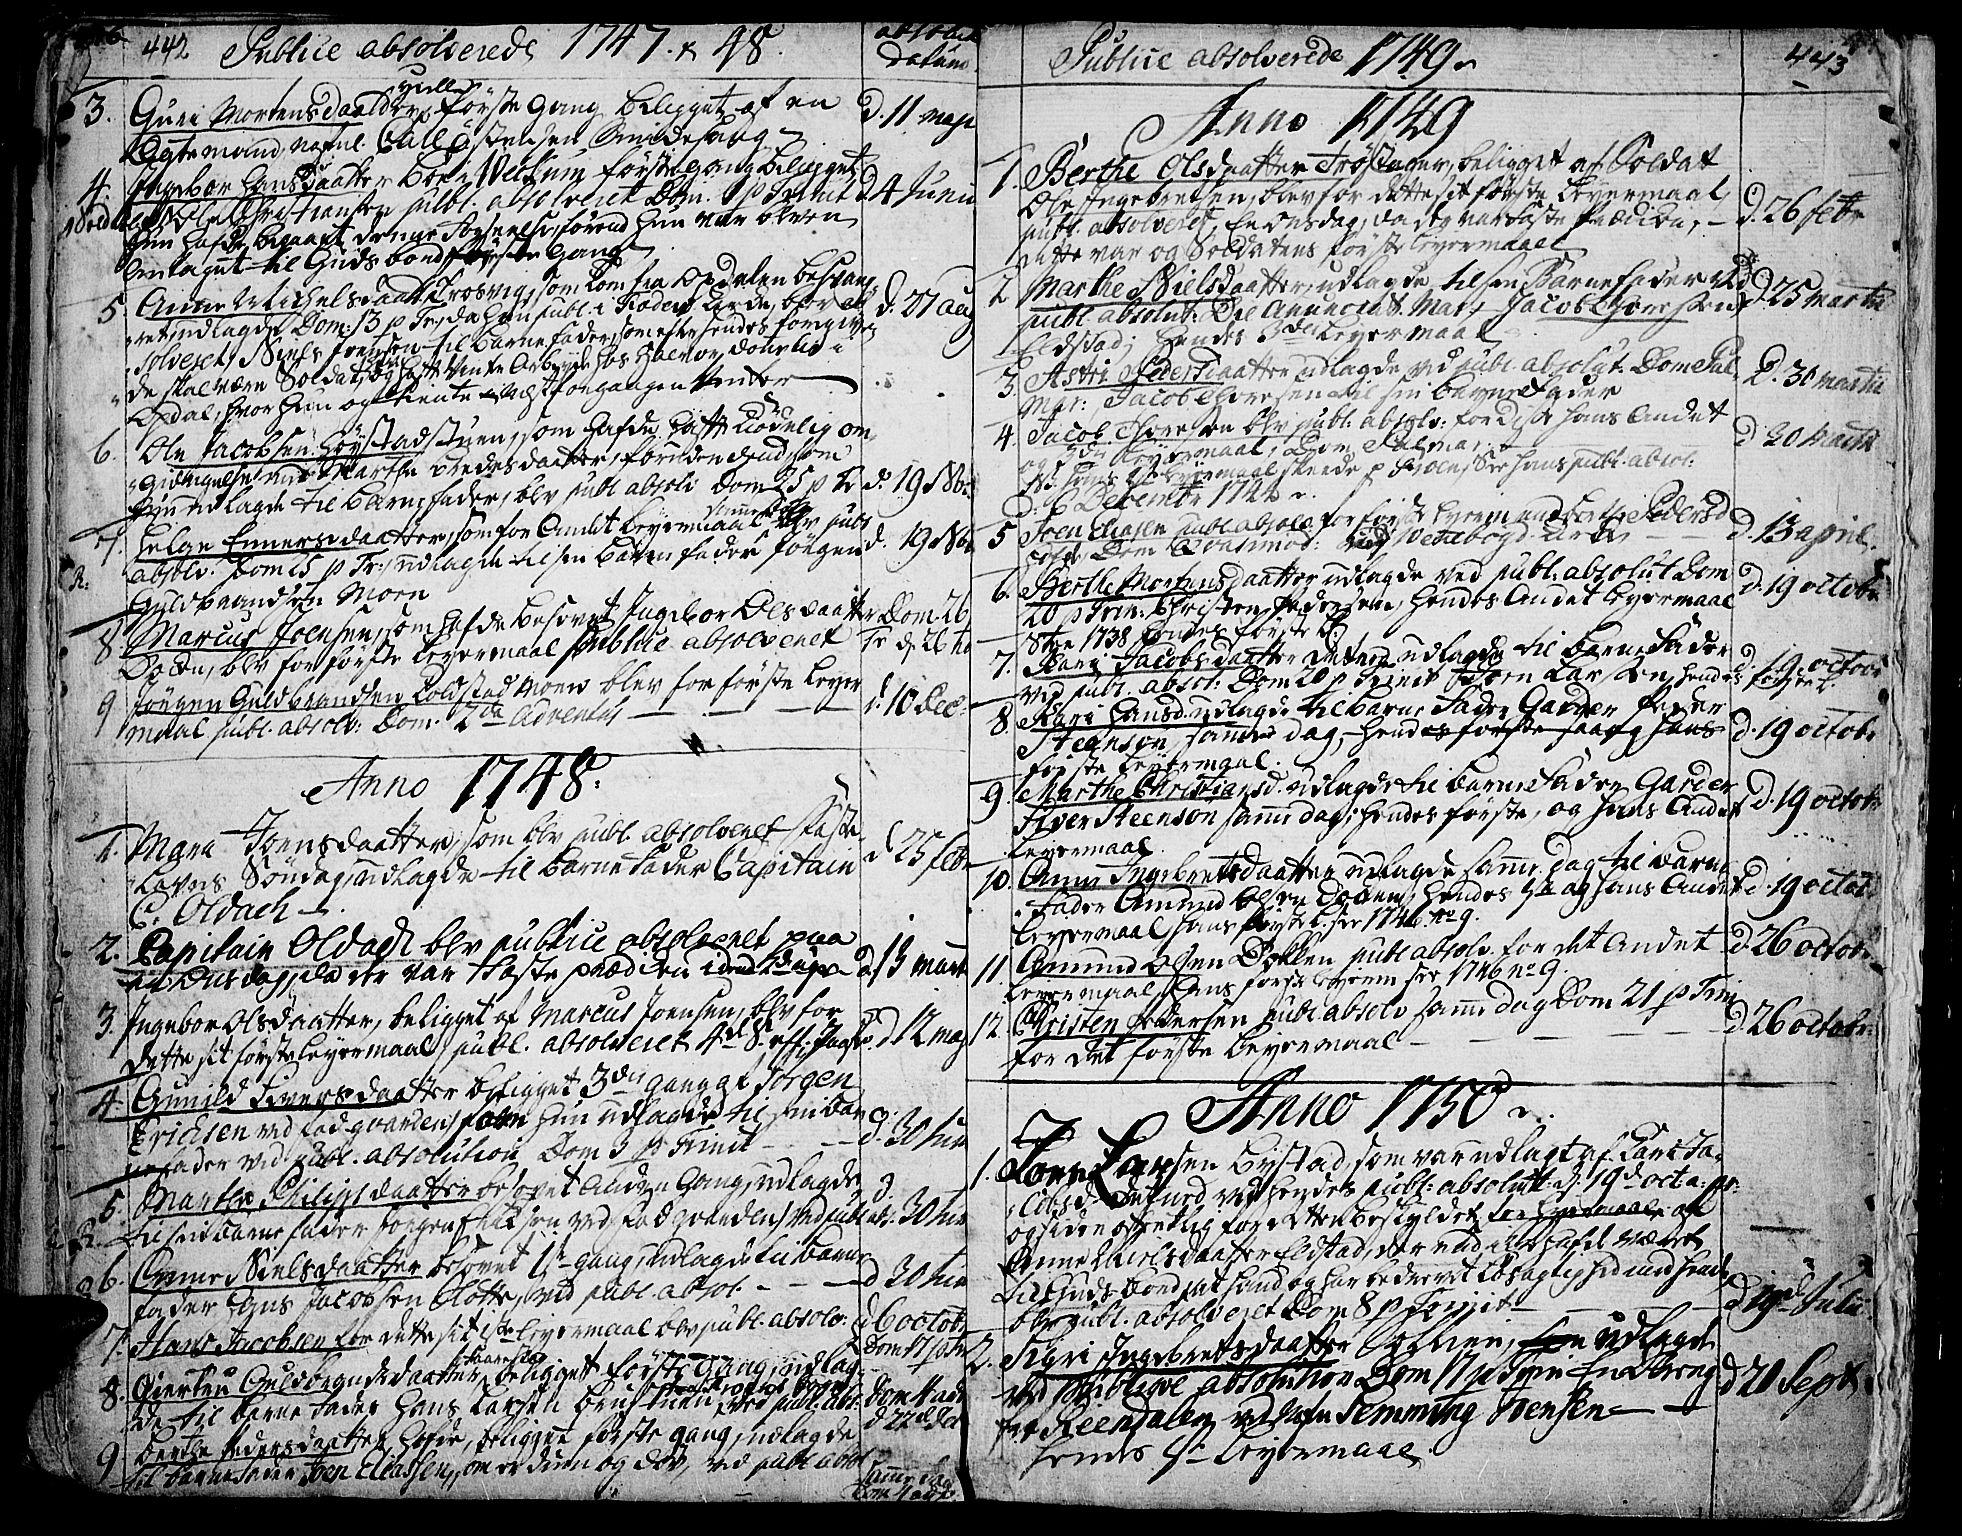 SAH, Ringebu prestekontor, Ministerialbok nr. 2, 1734-1780, s. 442-443